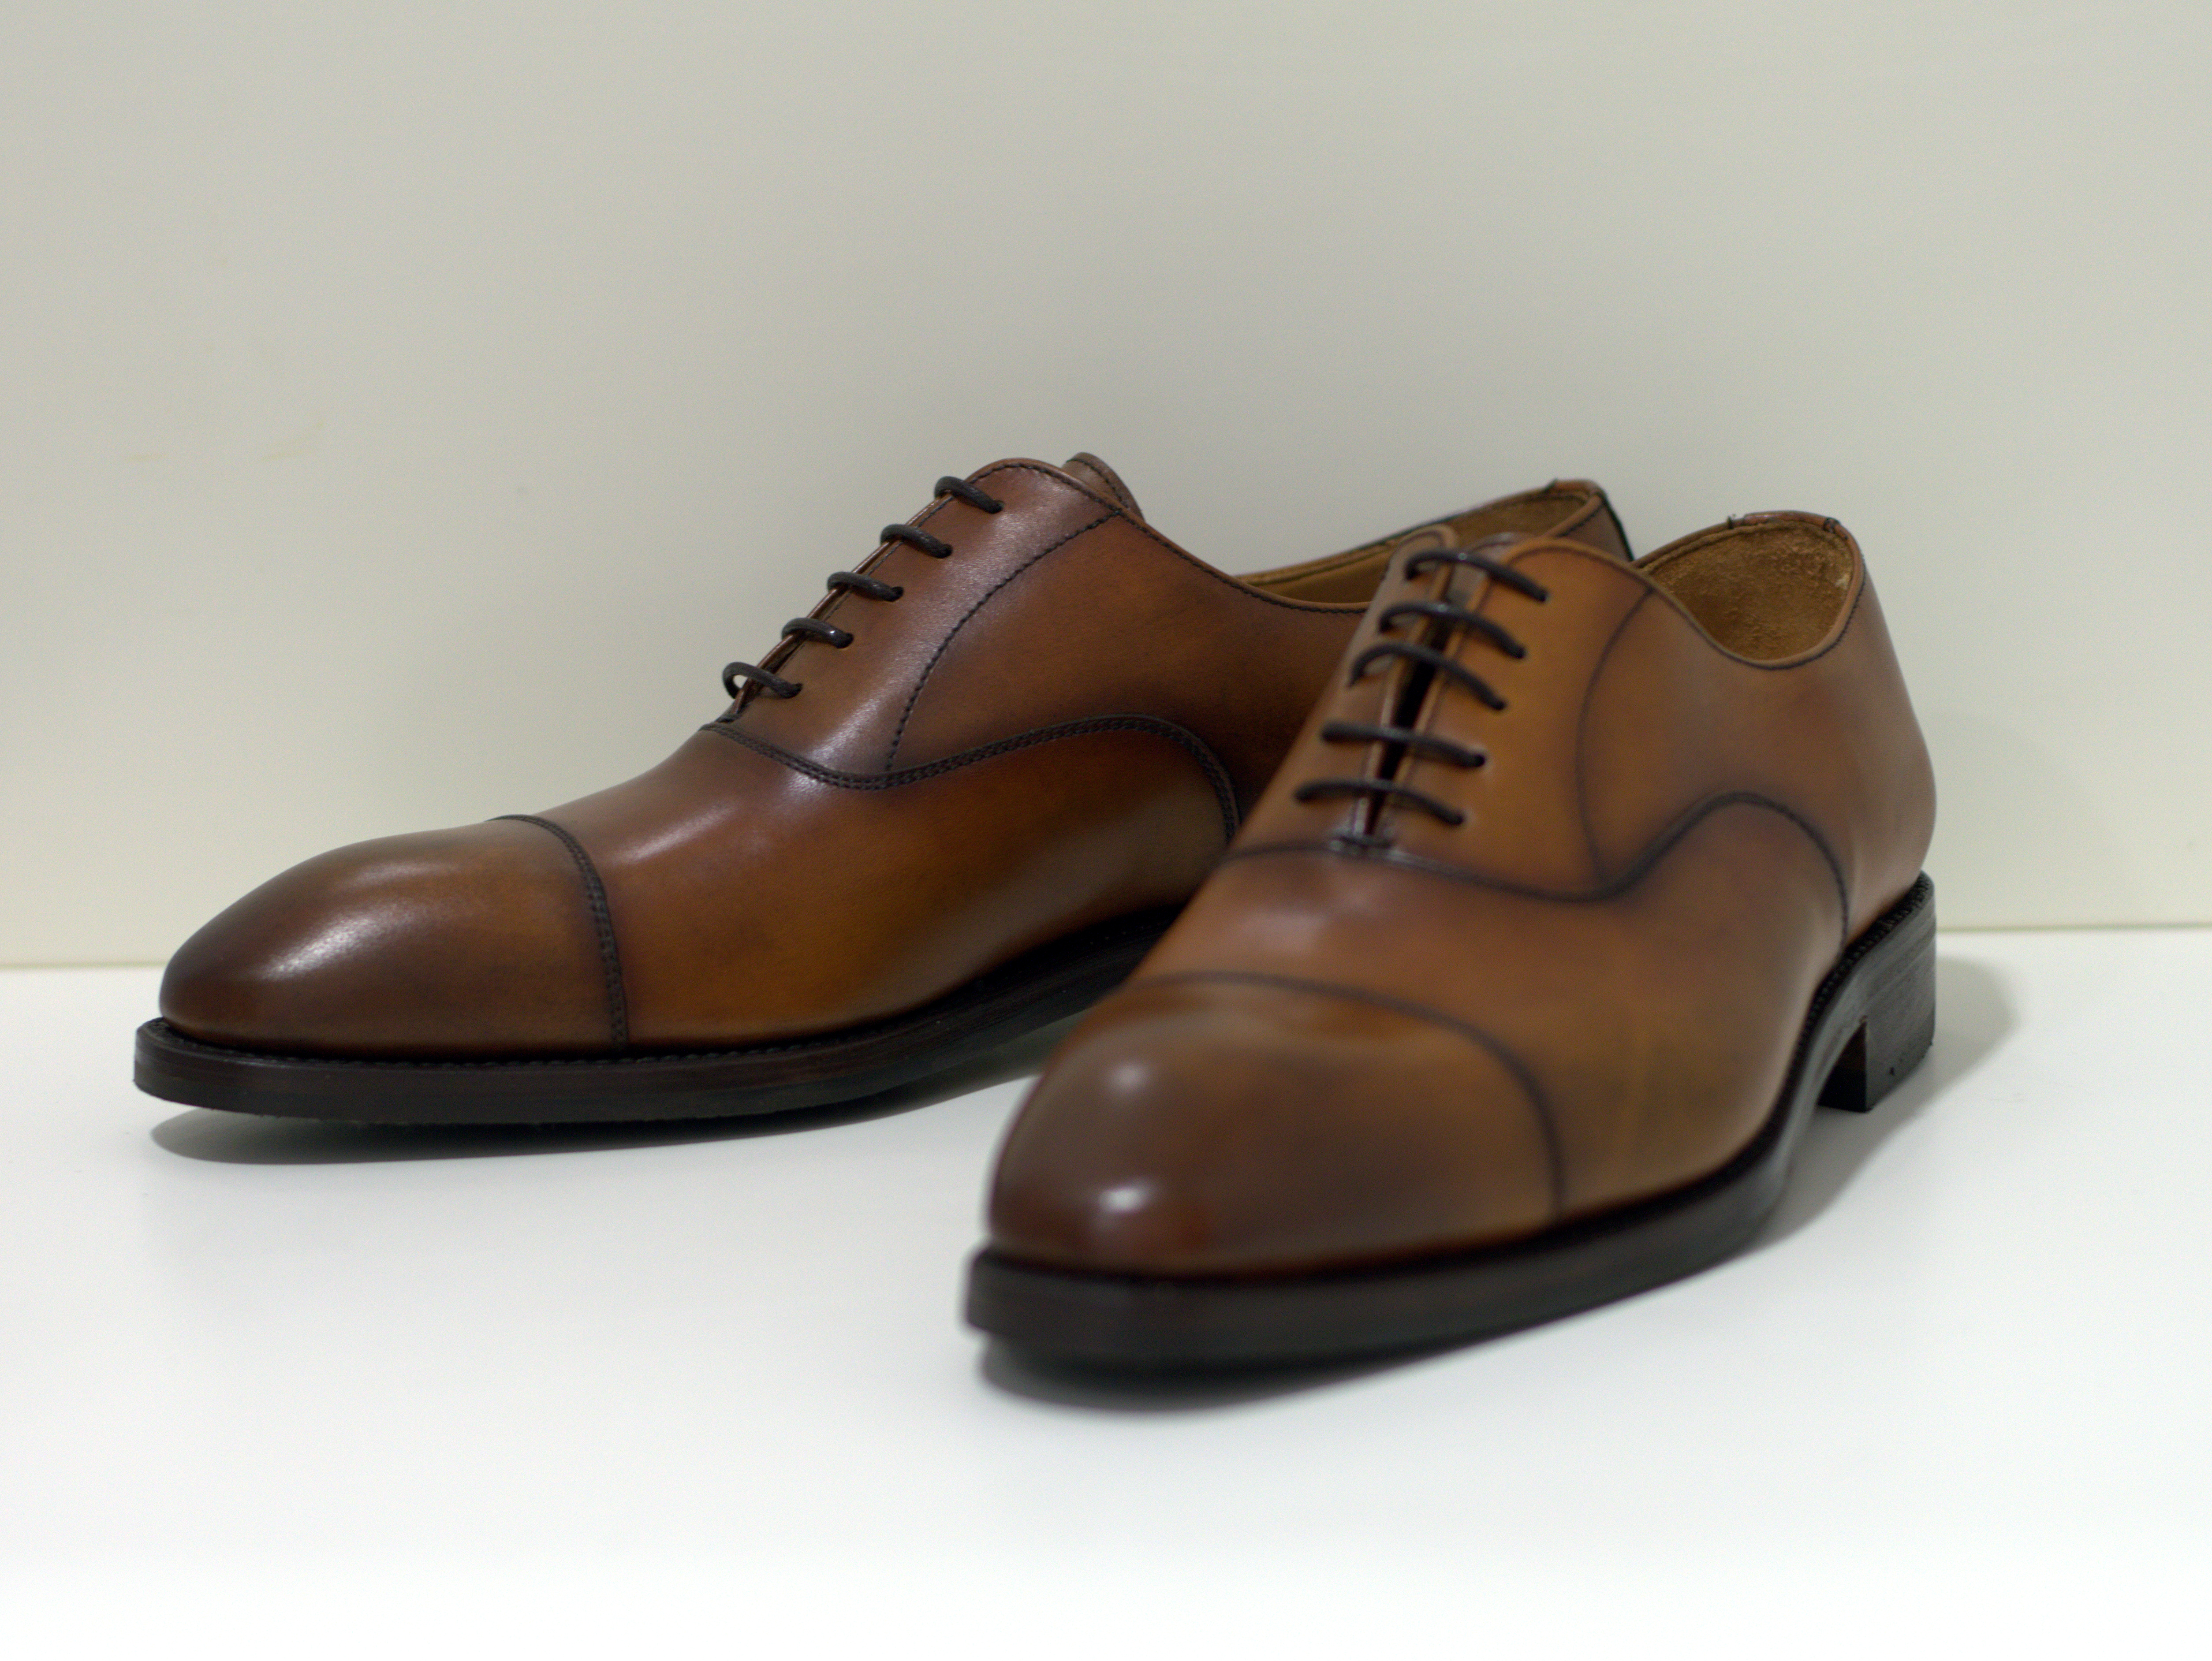 Berwick Rahmengenähter Oxford Schuh handgebürstet Lugo